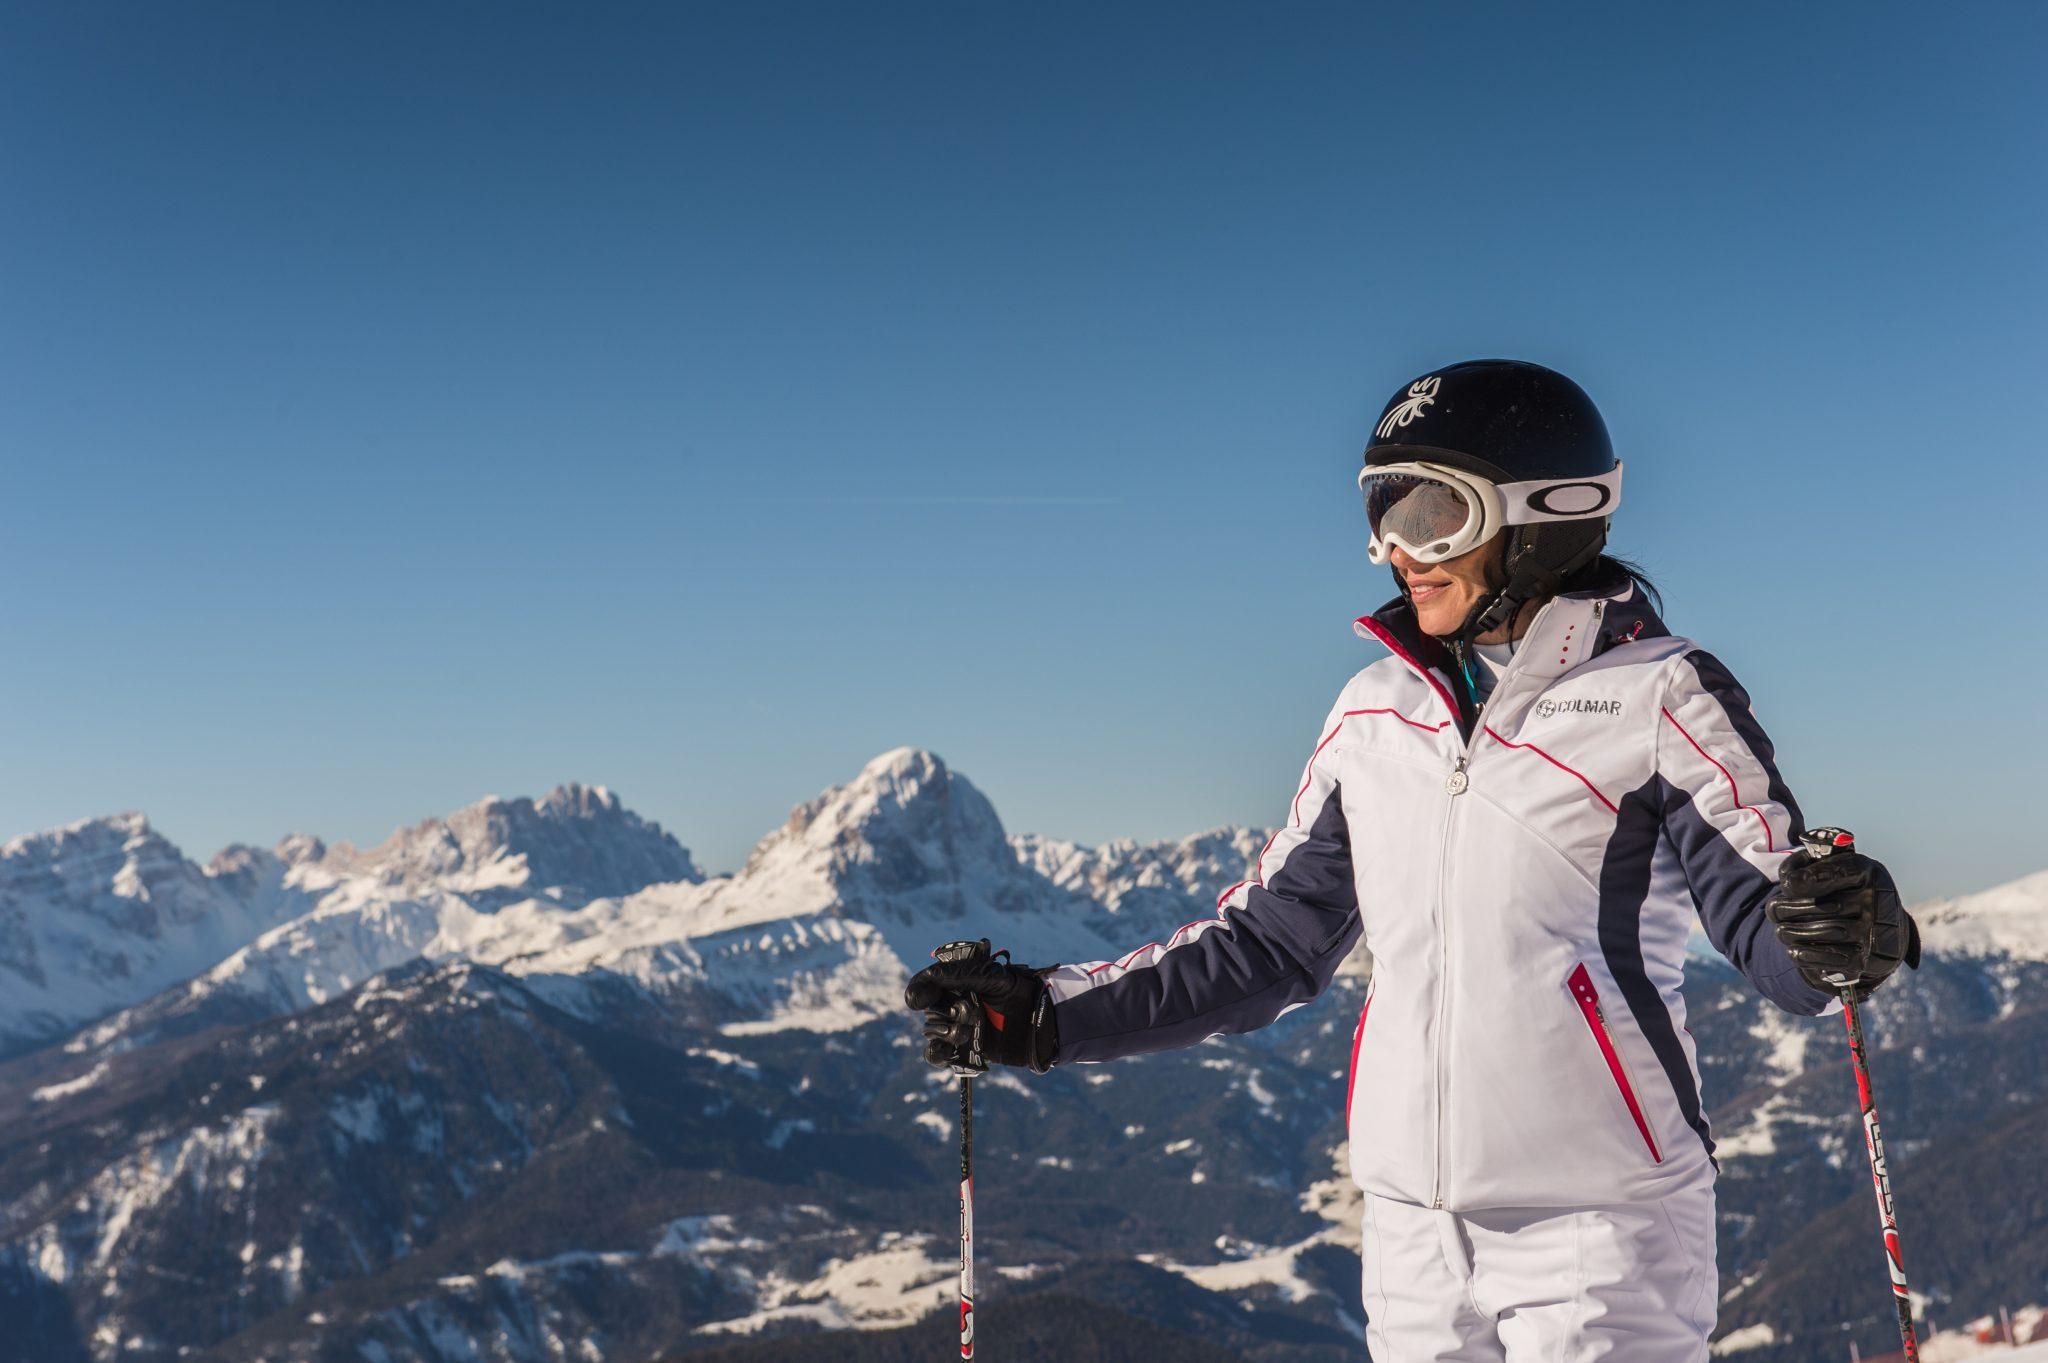 skifahrerin_macht_pause_vor_bergpanorama_c_tvb_kronplatz_-_photo_harald_wisthaler_olang